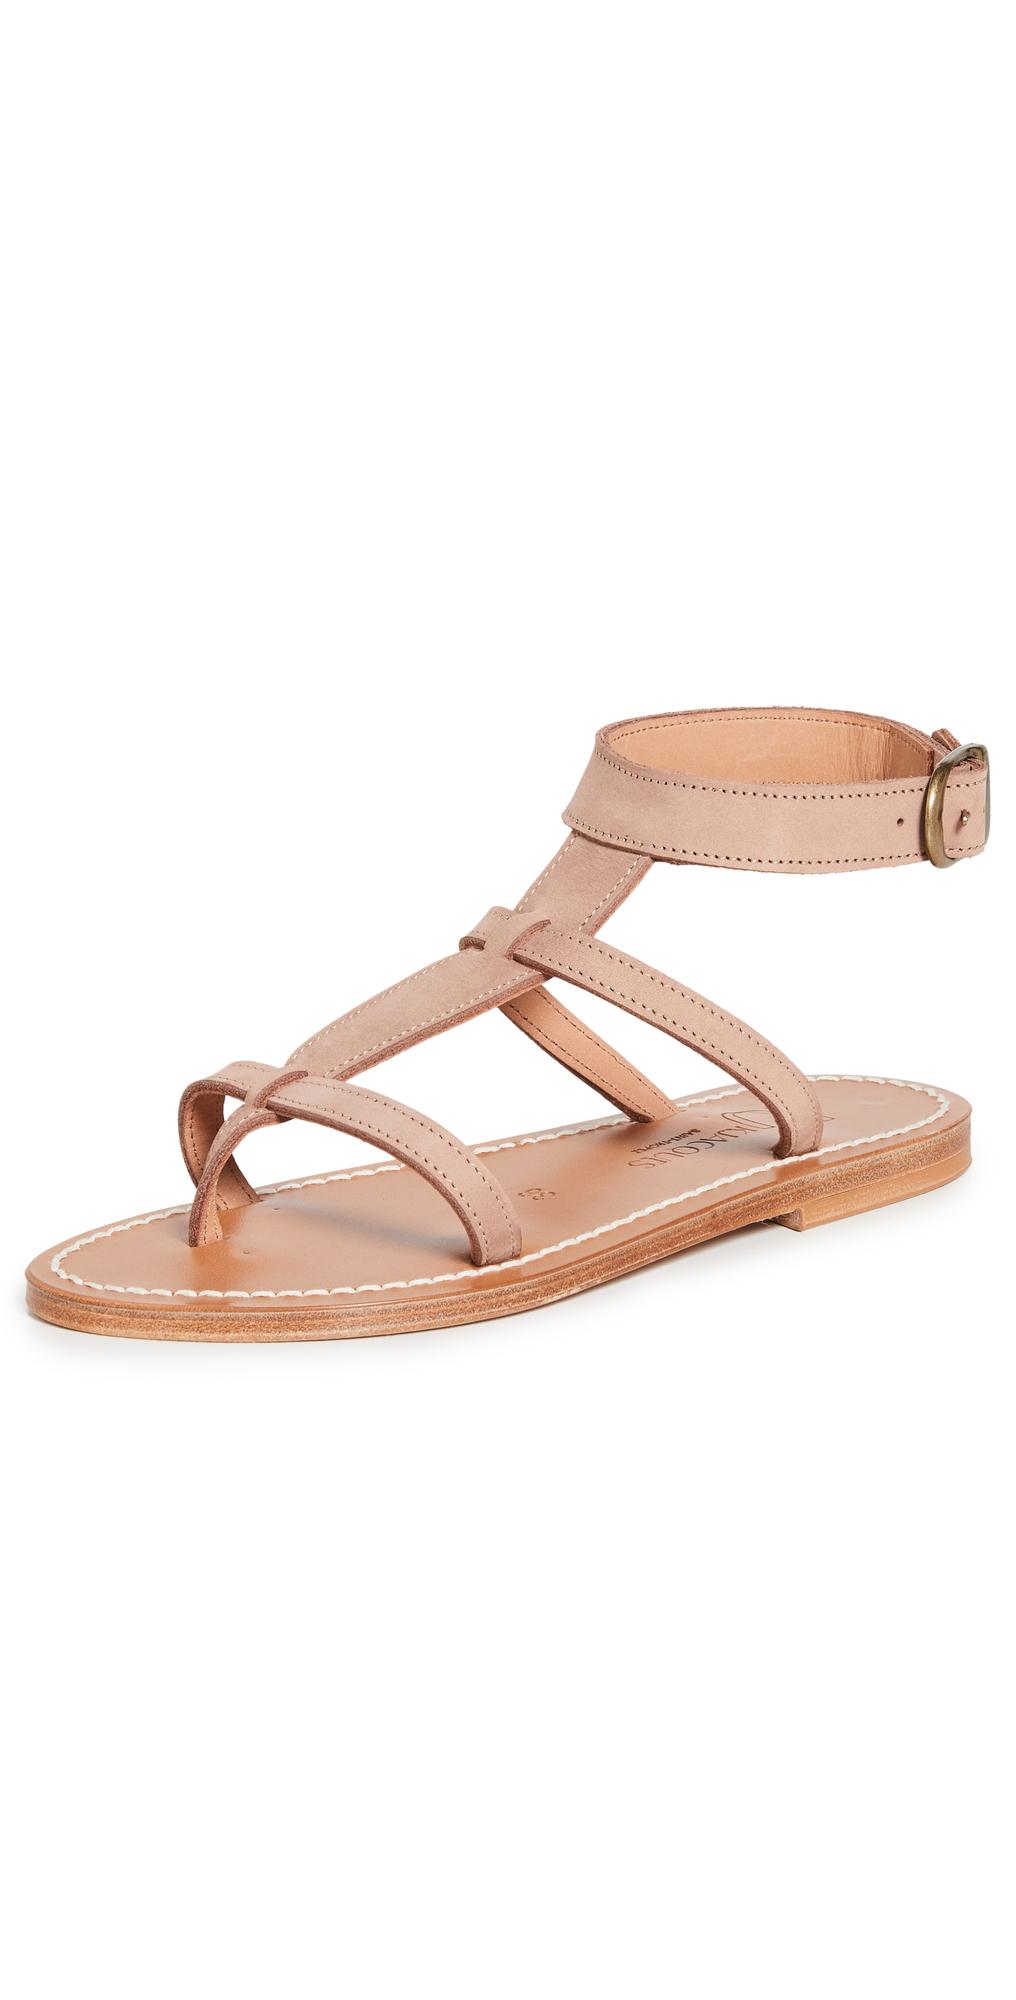 Artimon Sandals